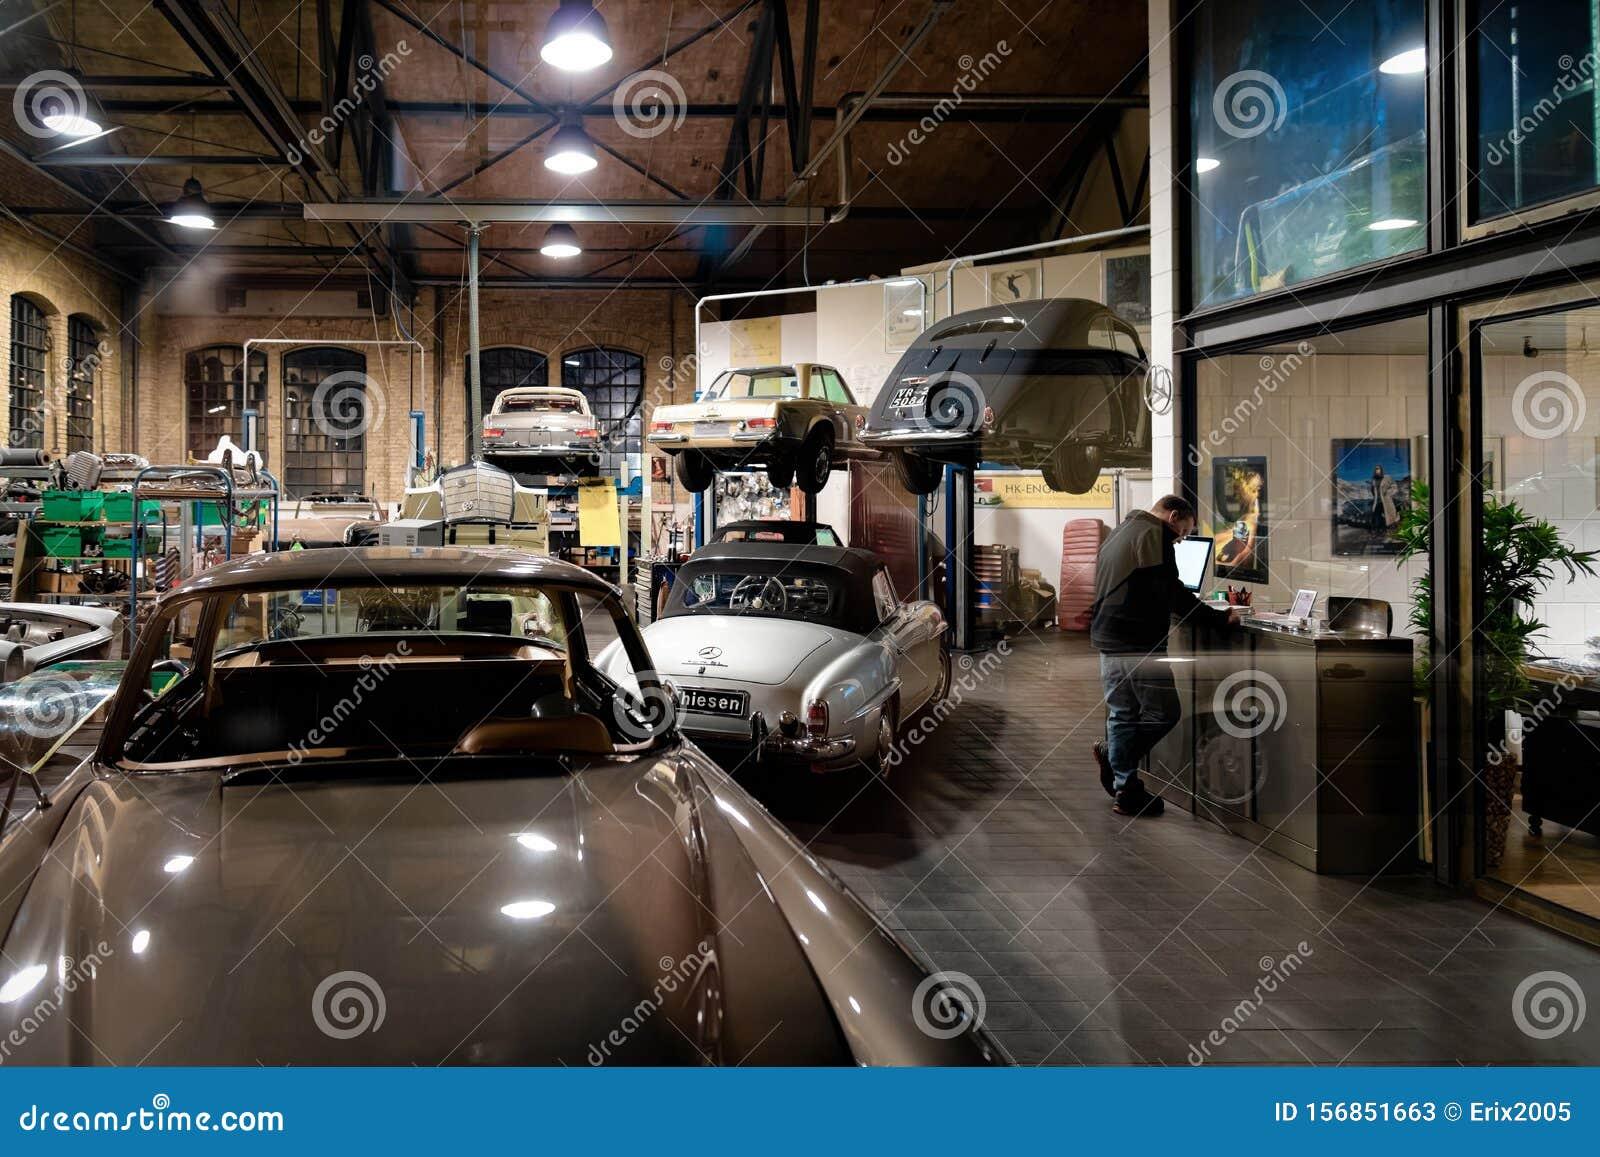 Retro Car Garage Auto Repair Shops Editorial Stock Photo Image Of Design Parking 156851663